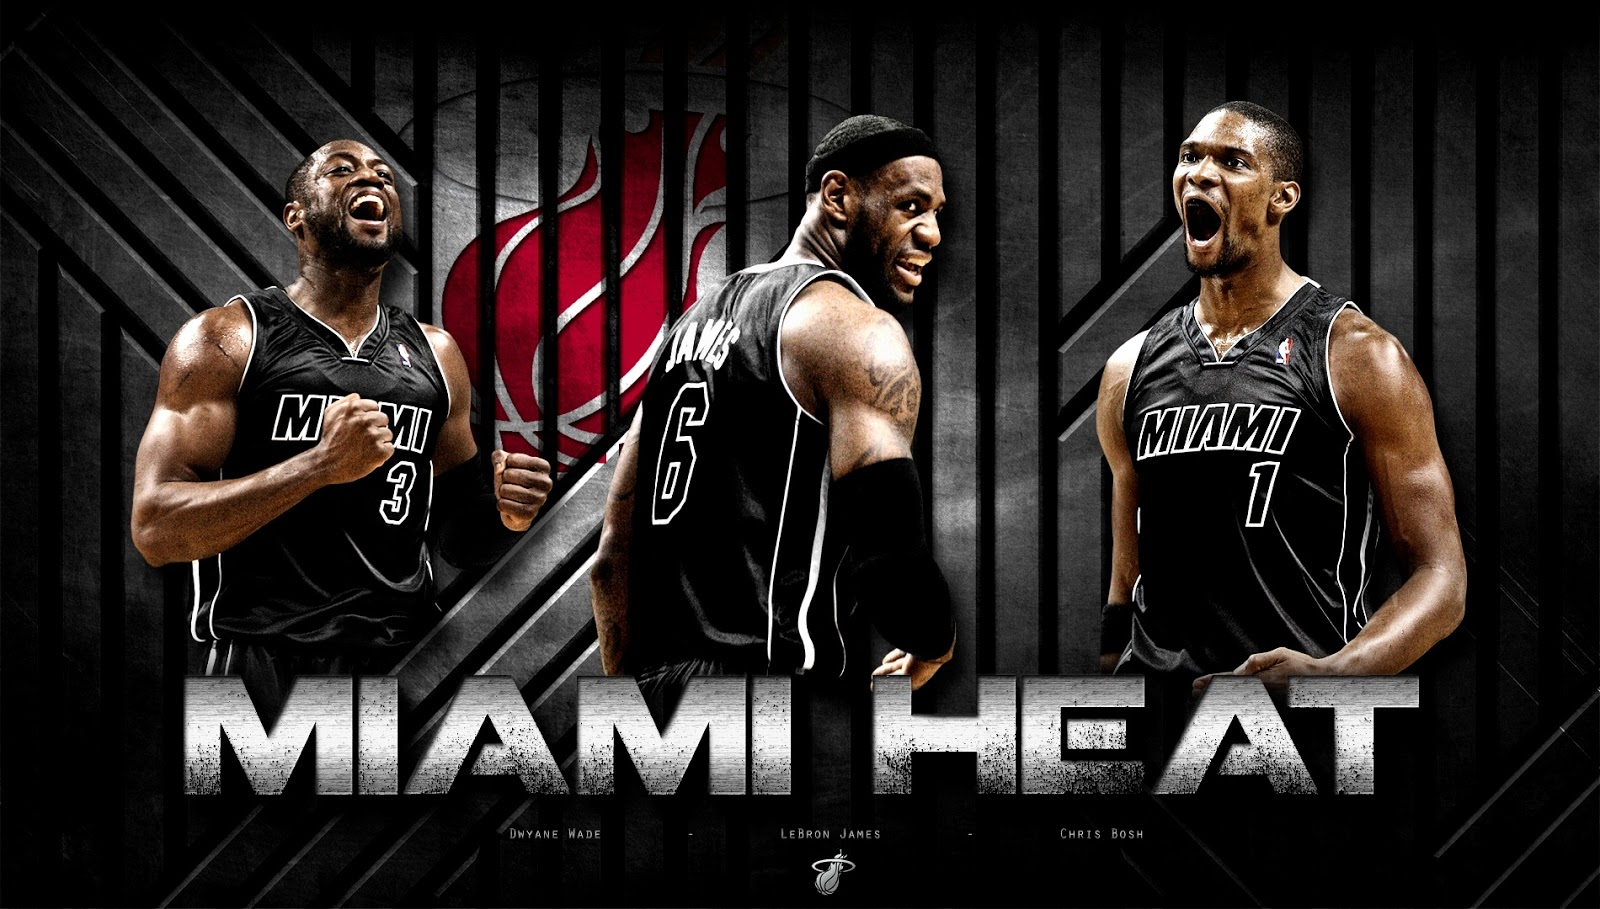 Miami Heat 2013 NBA Champions Wallpapers Free HD | TheNbaZone.com